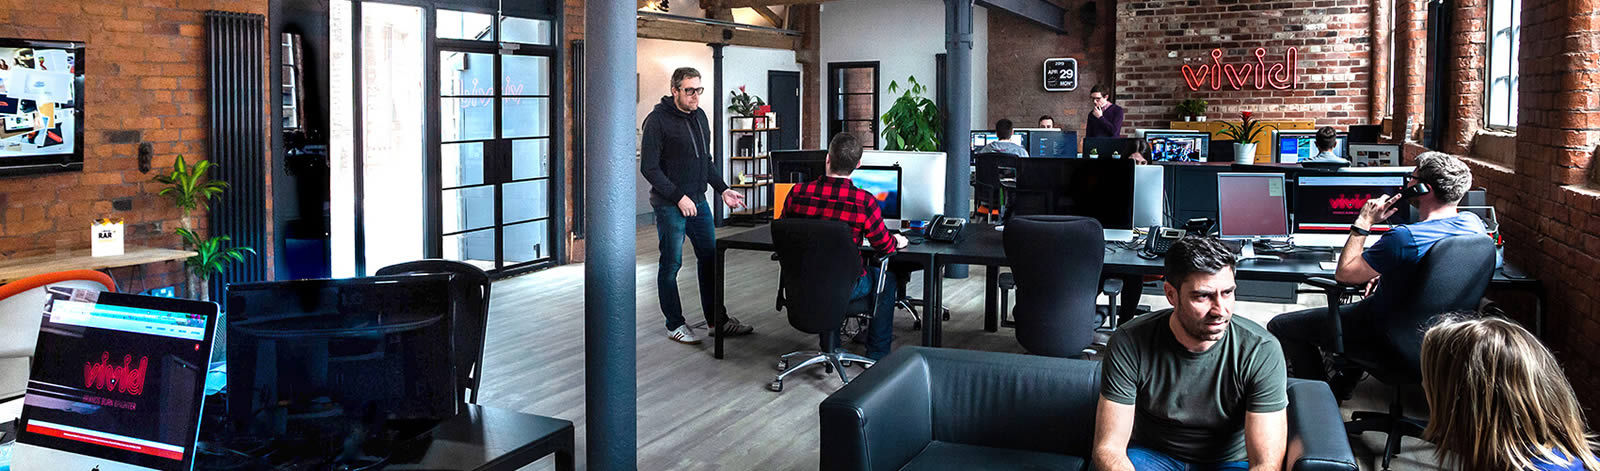 Inside the Vivid studio